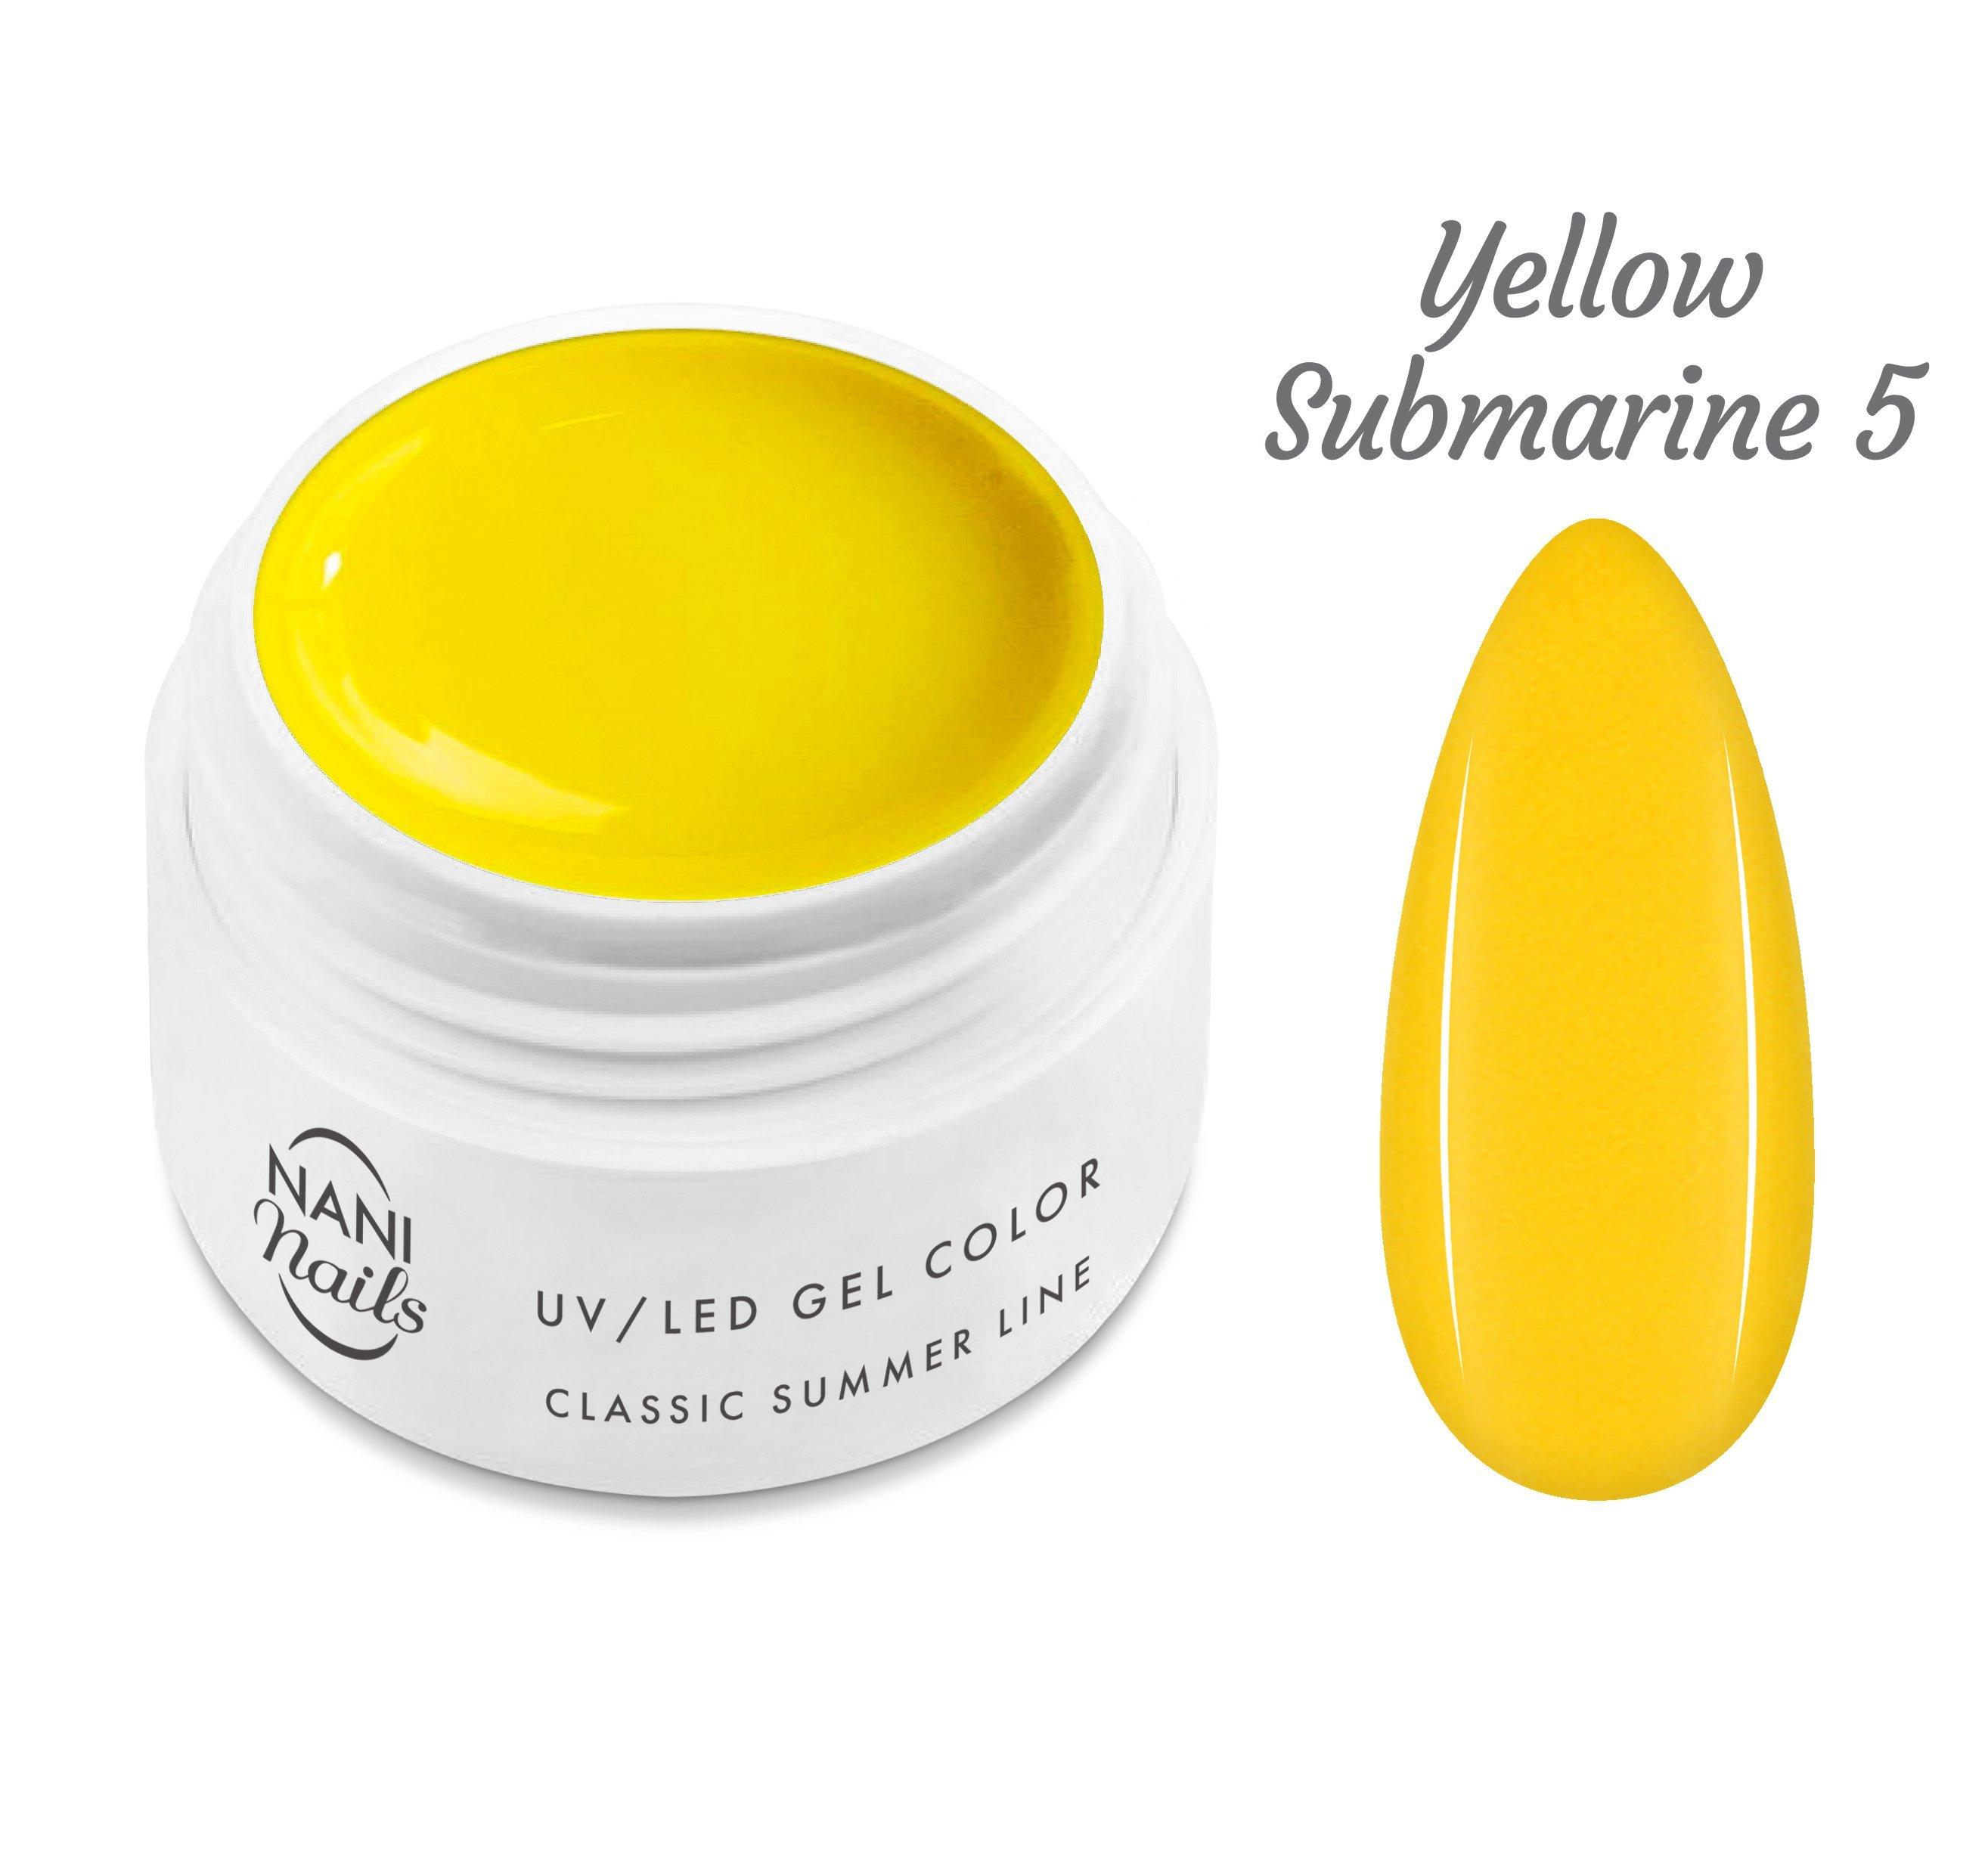 NANI UV gél Classic Summer Line 5 ml - Yellow Submarine